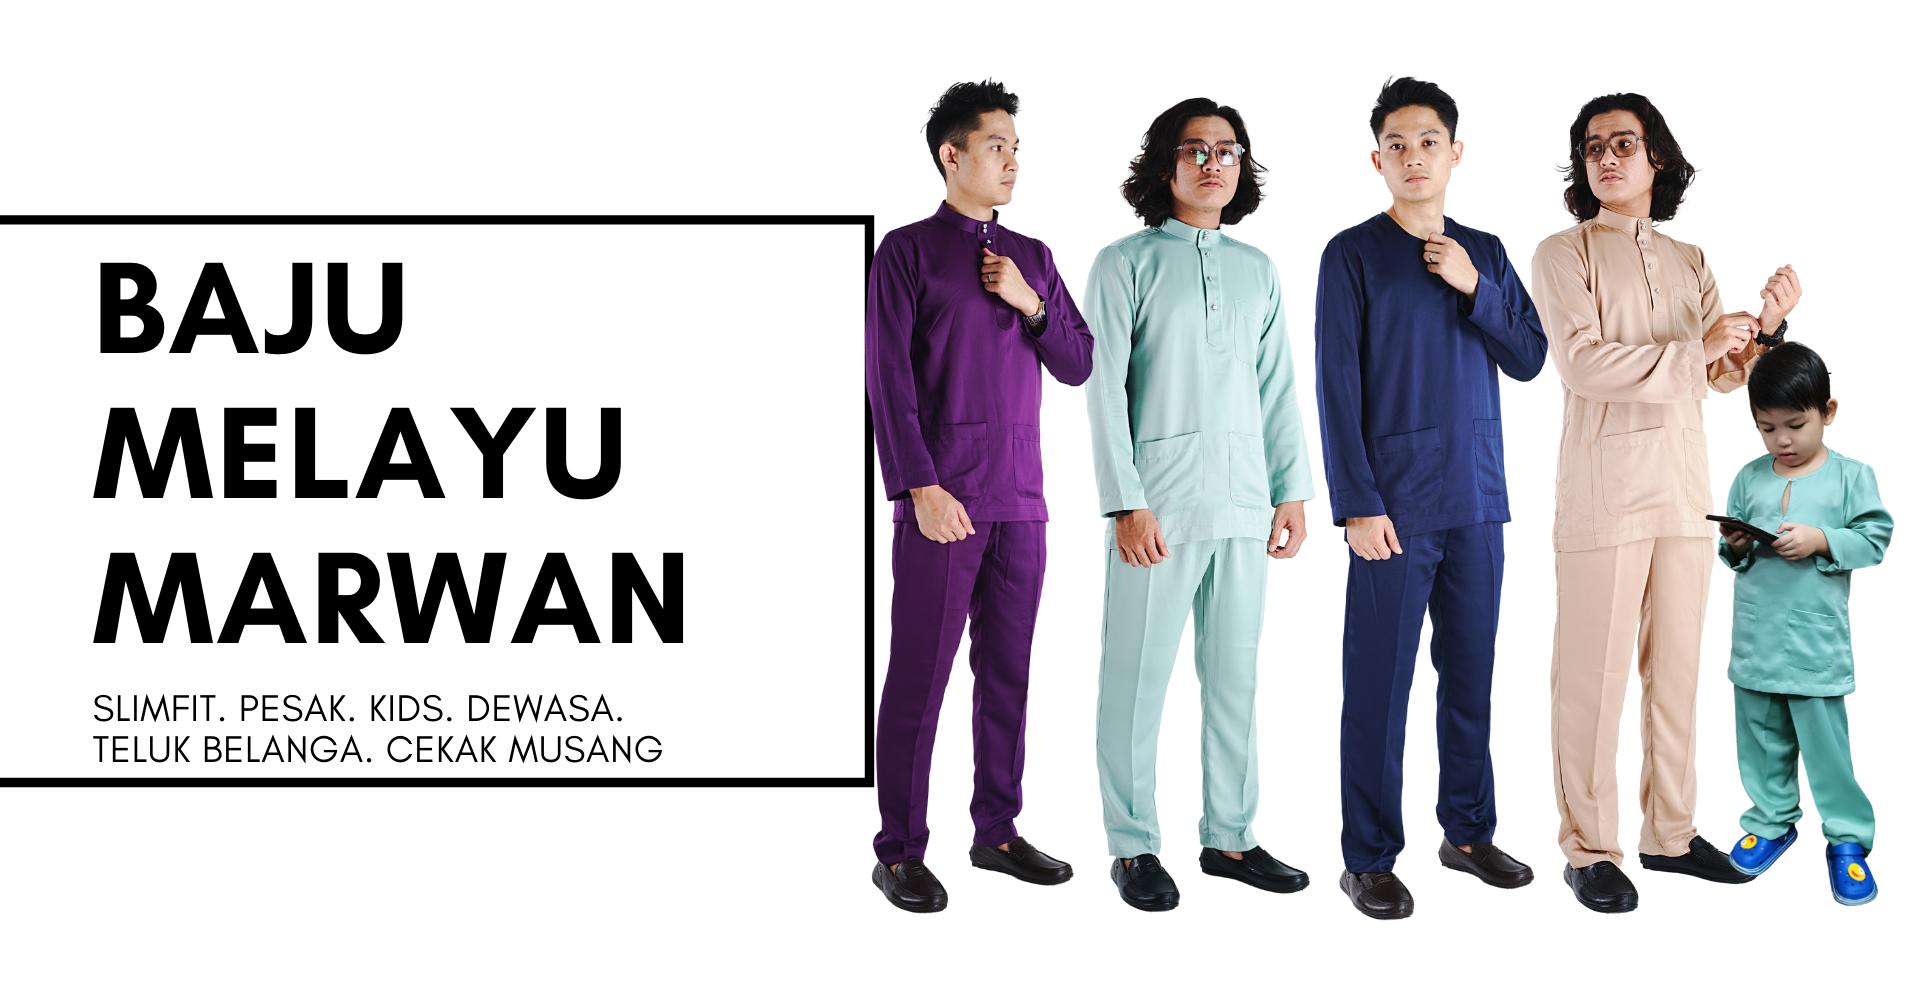 Baju Melayu  Marwan